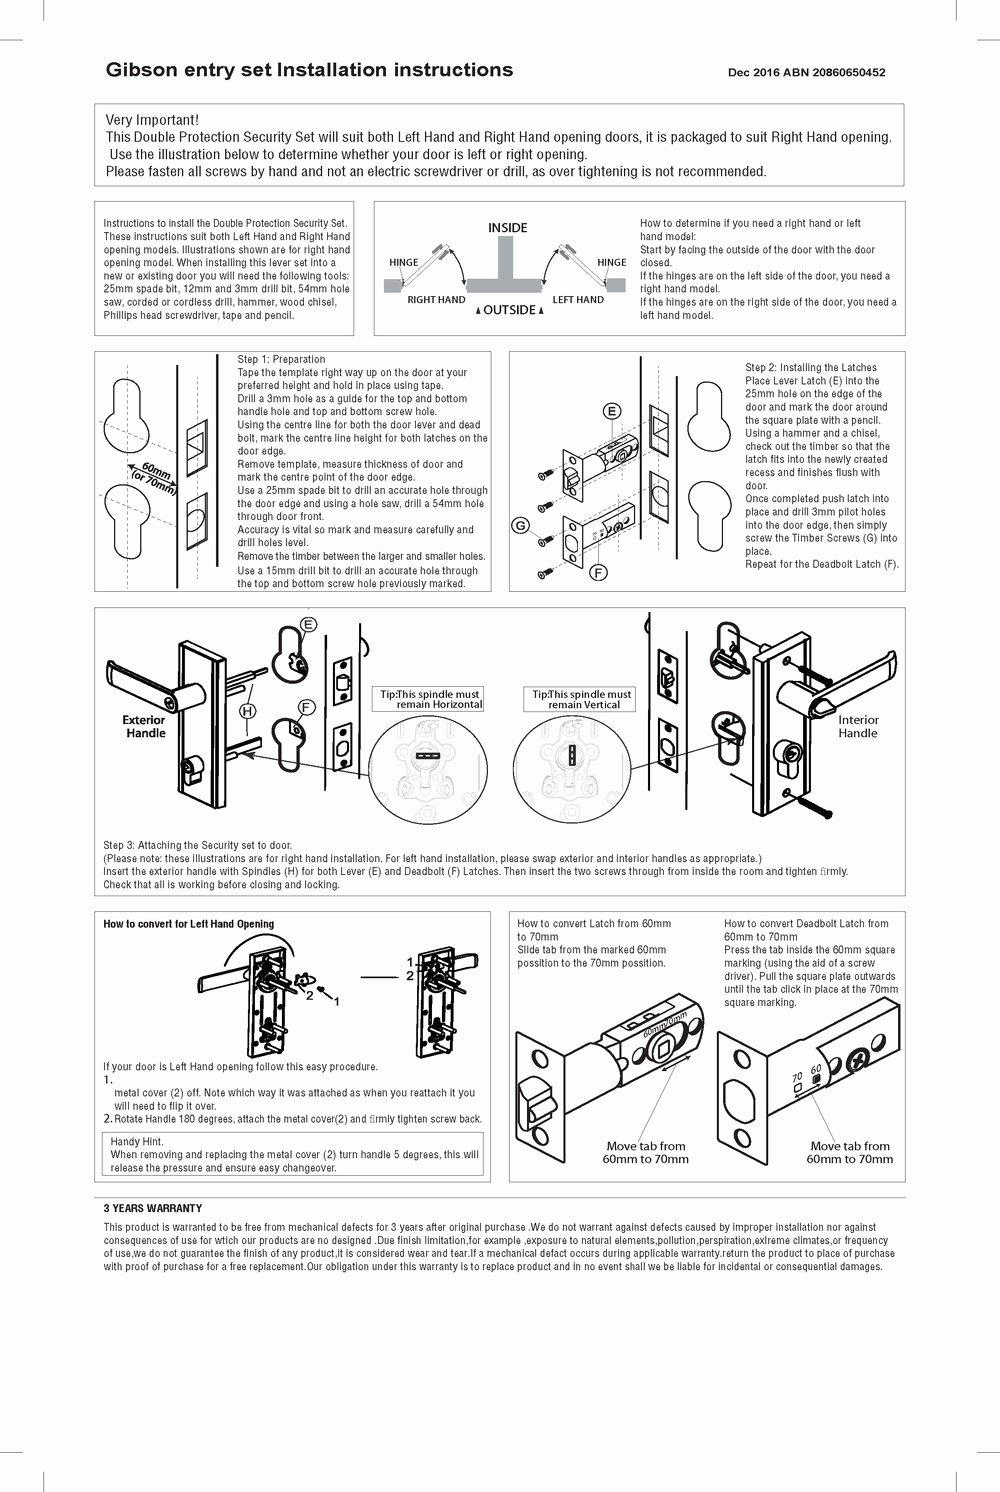 Wiring Instructions Template Best Of Nidus Downloads — Nidus